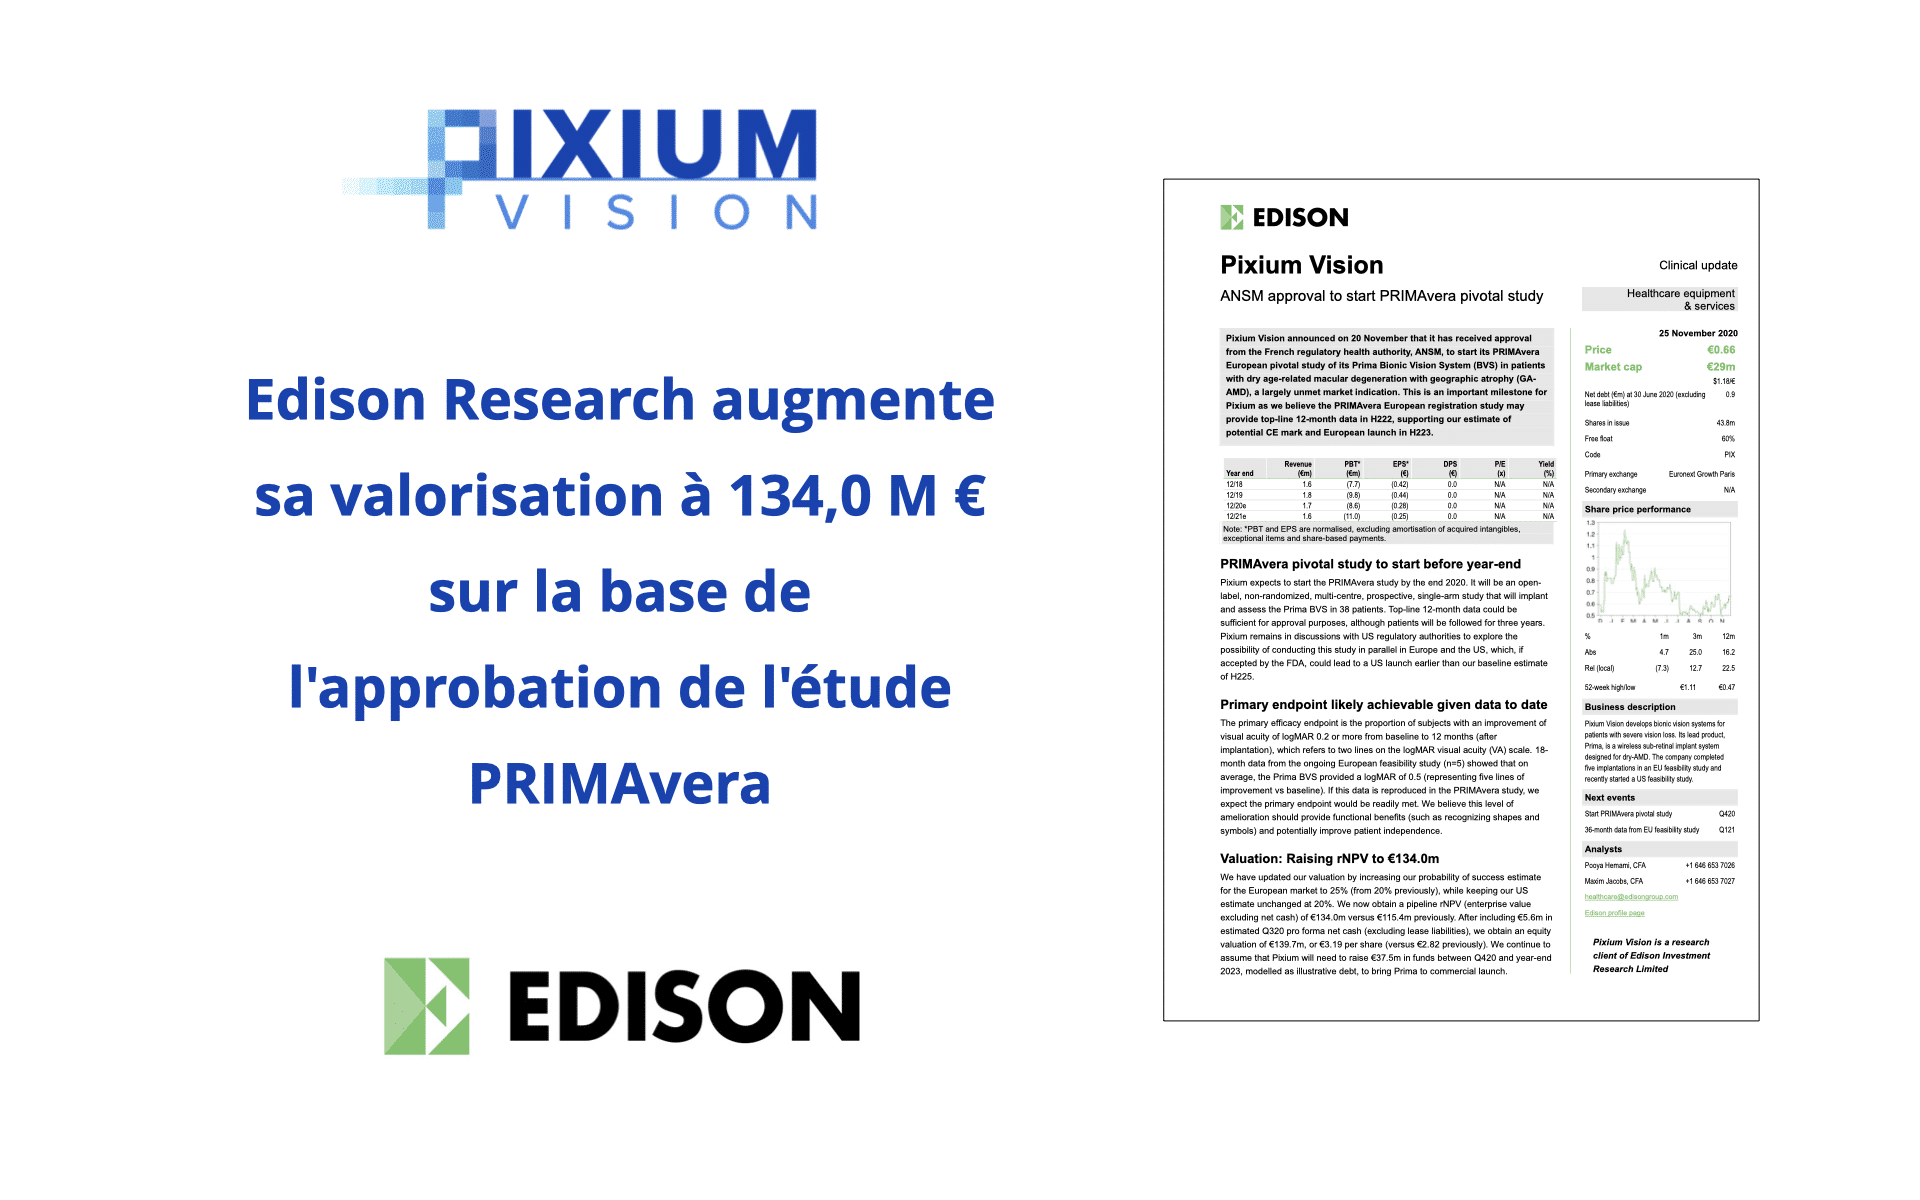 Edison Research augmente sa valorisation à 134,0 M euro